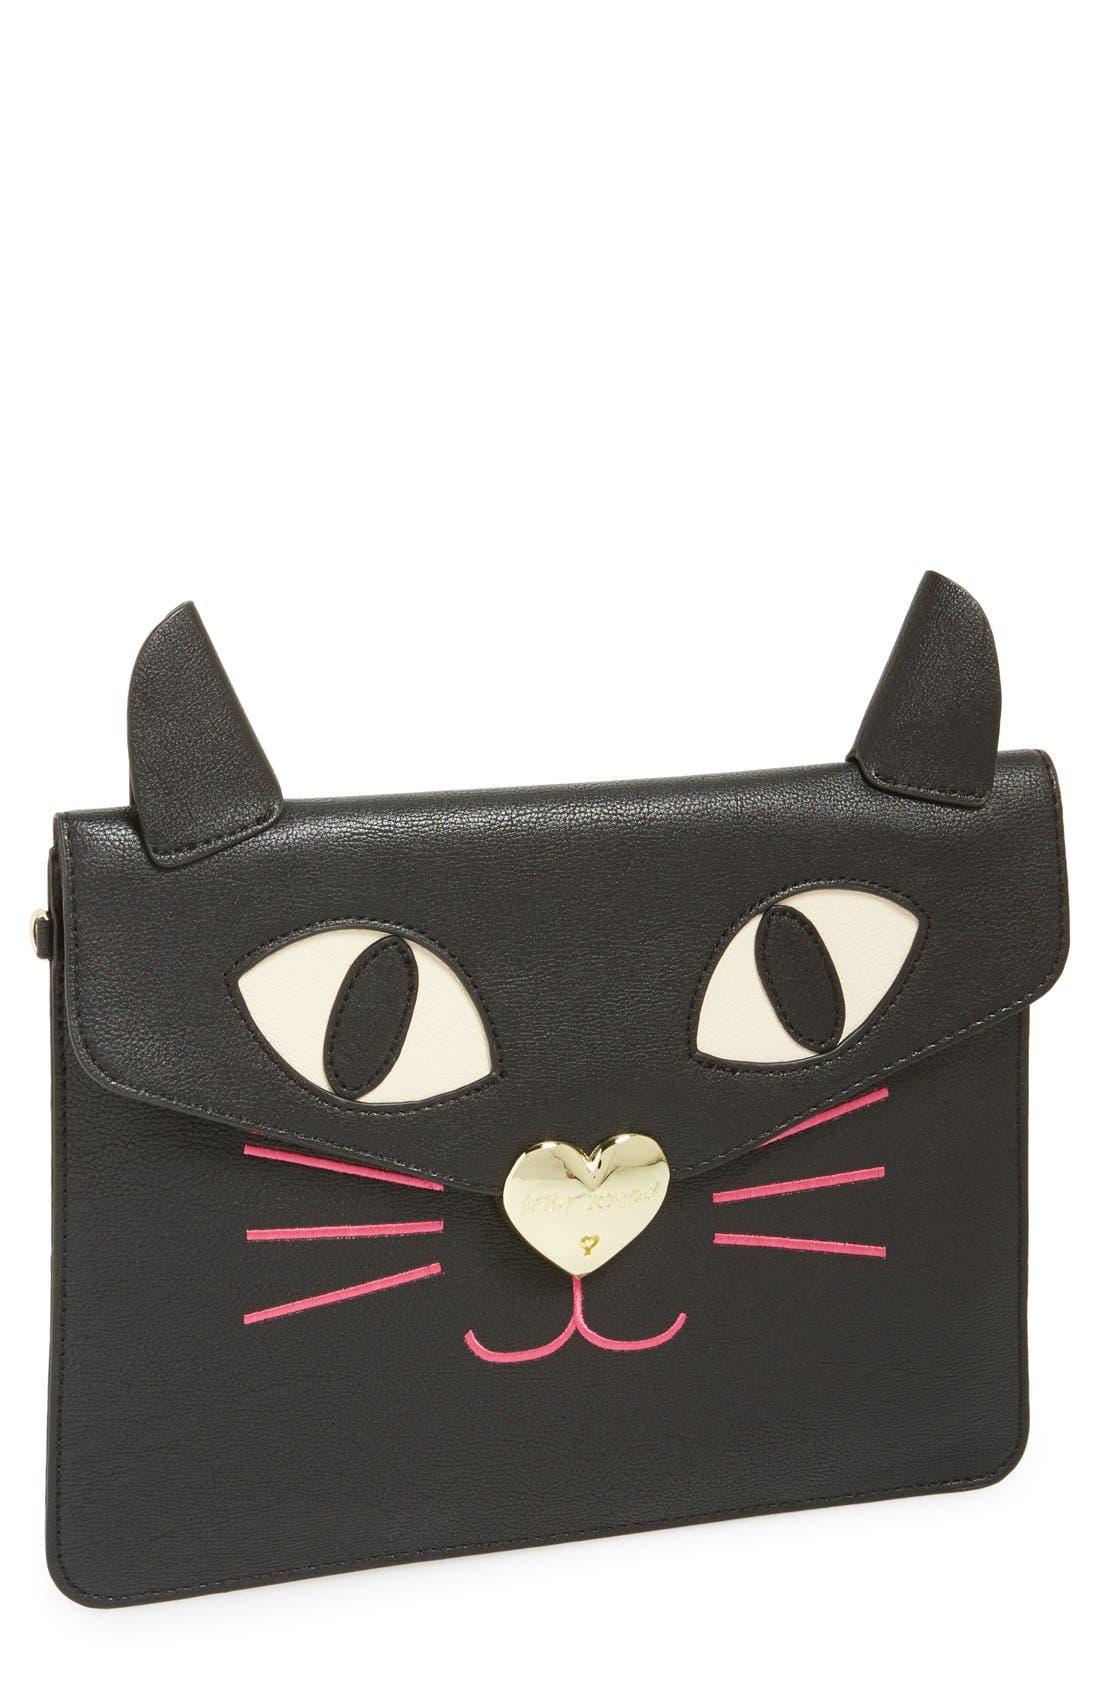 Main Image - Betsey Johnson Cat Clutch